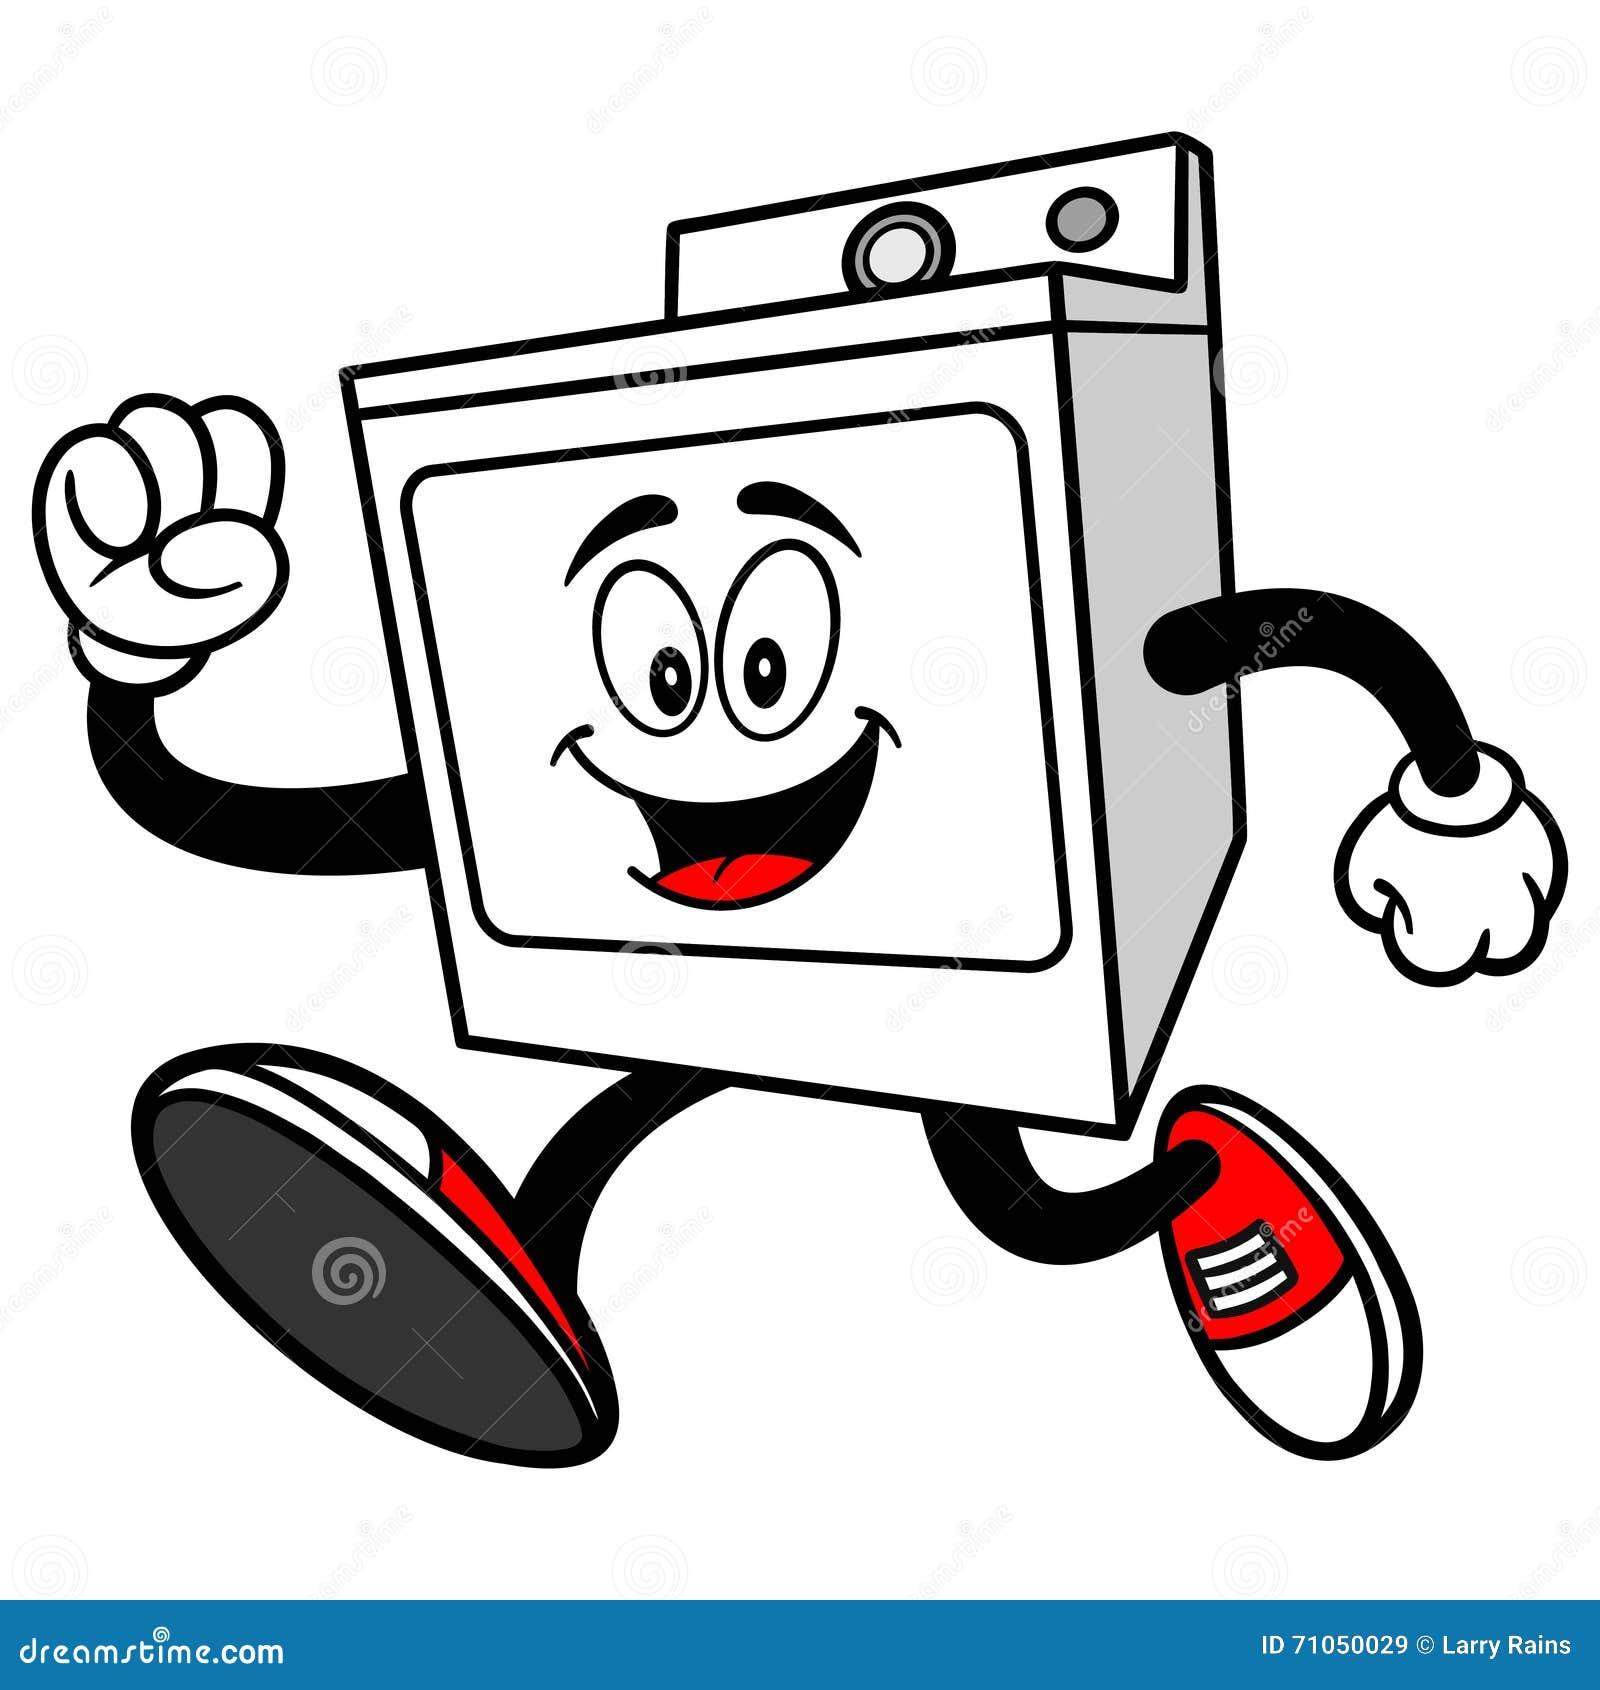 Tumble Dryer Cartoon ~ Mesmerizing clothes dryer clipart inspiration design